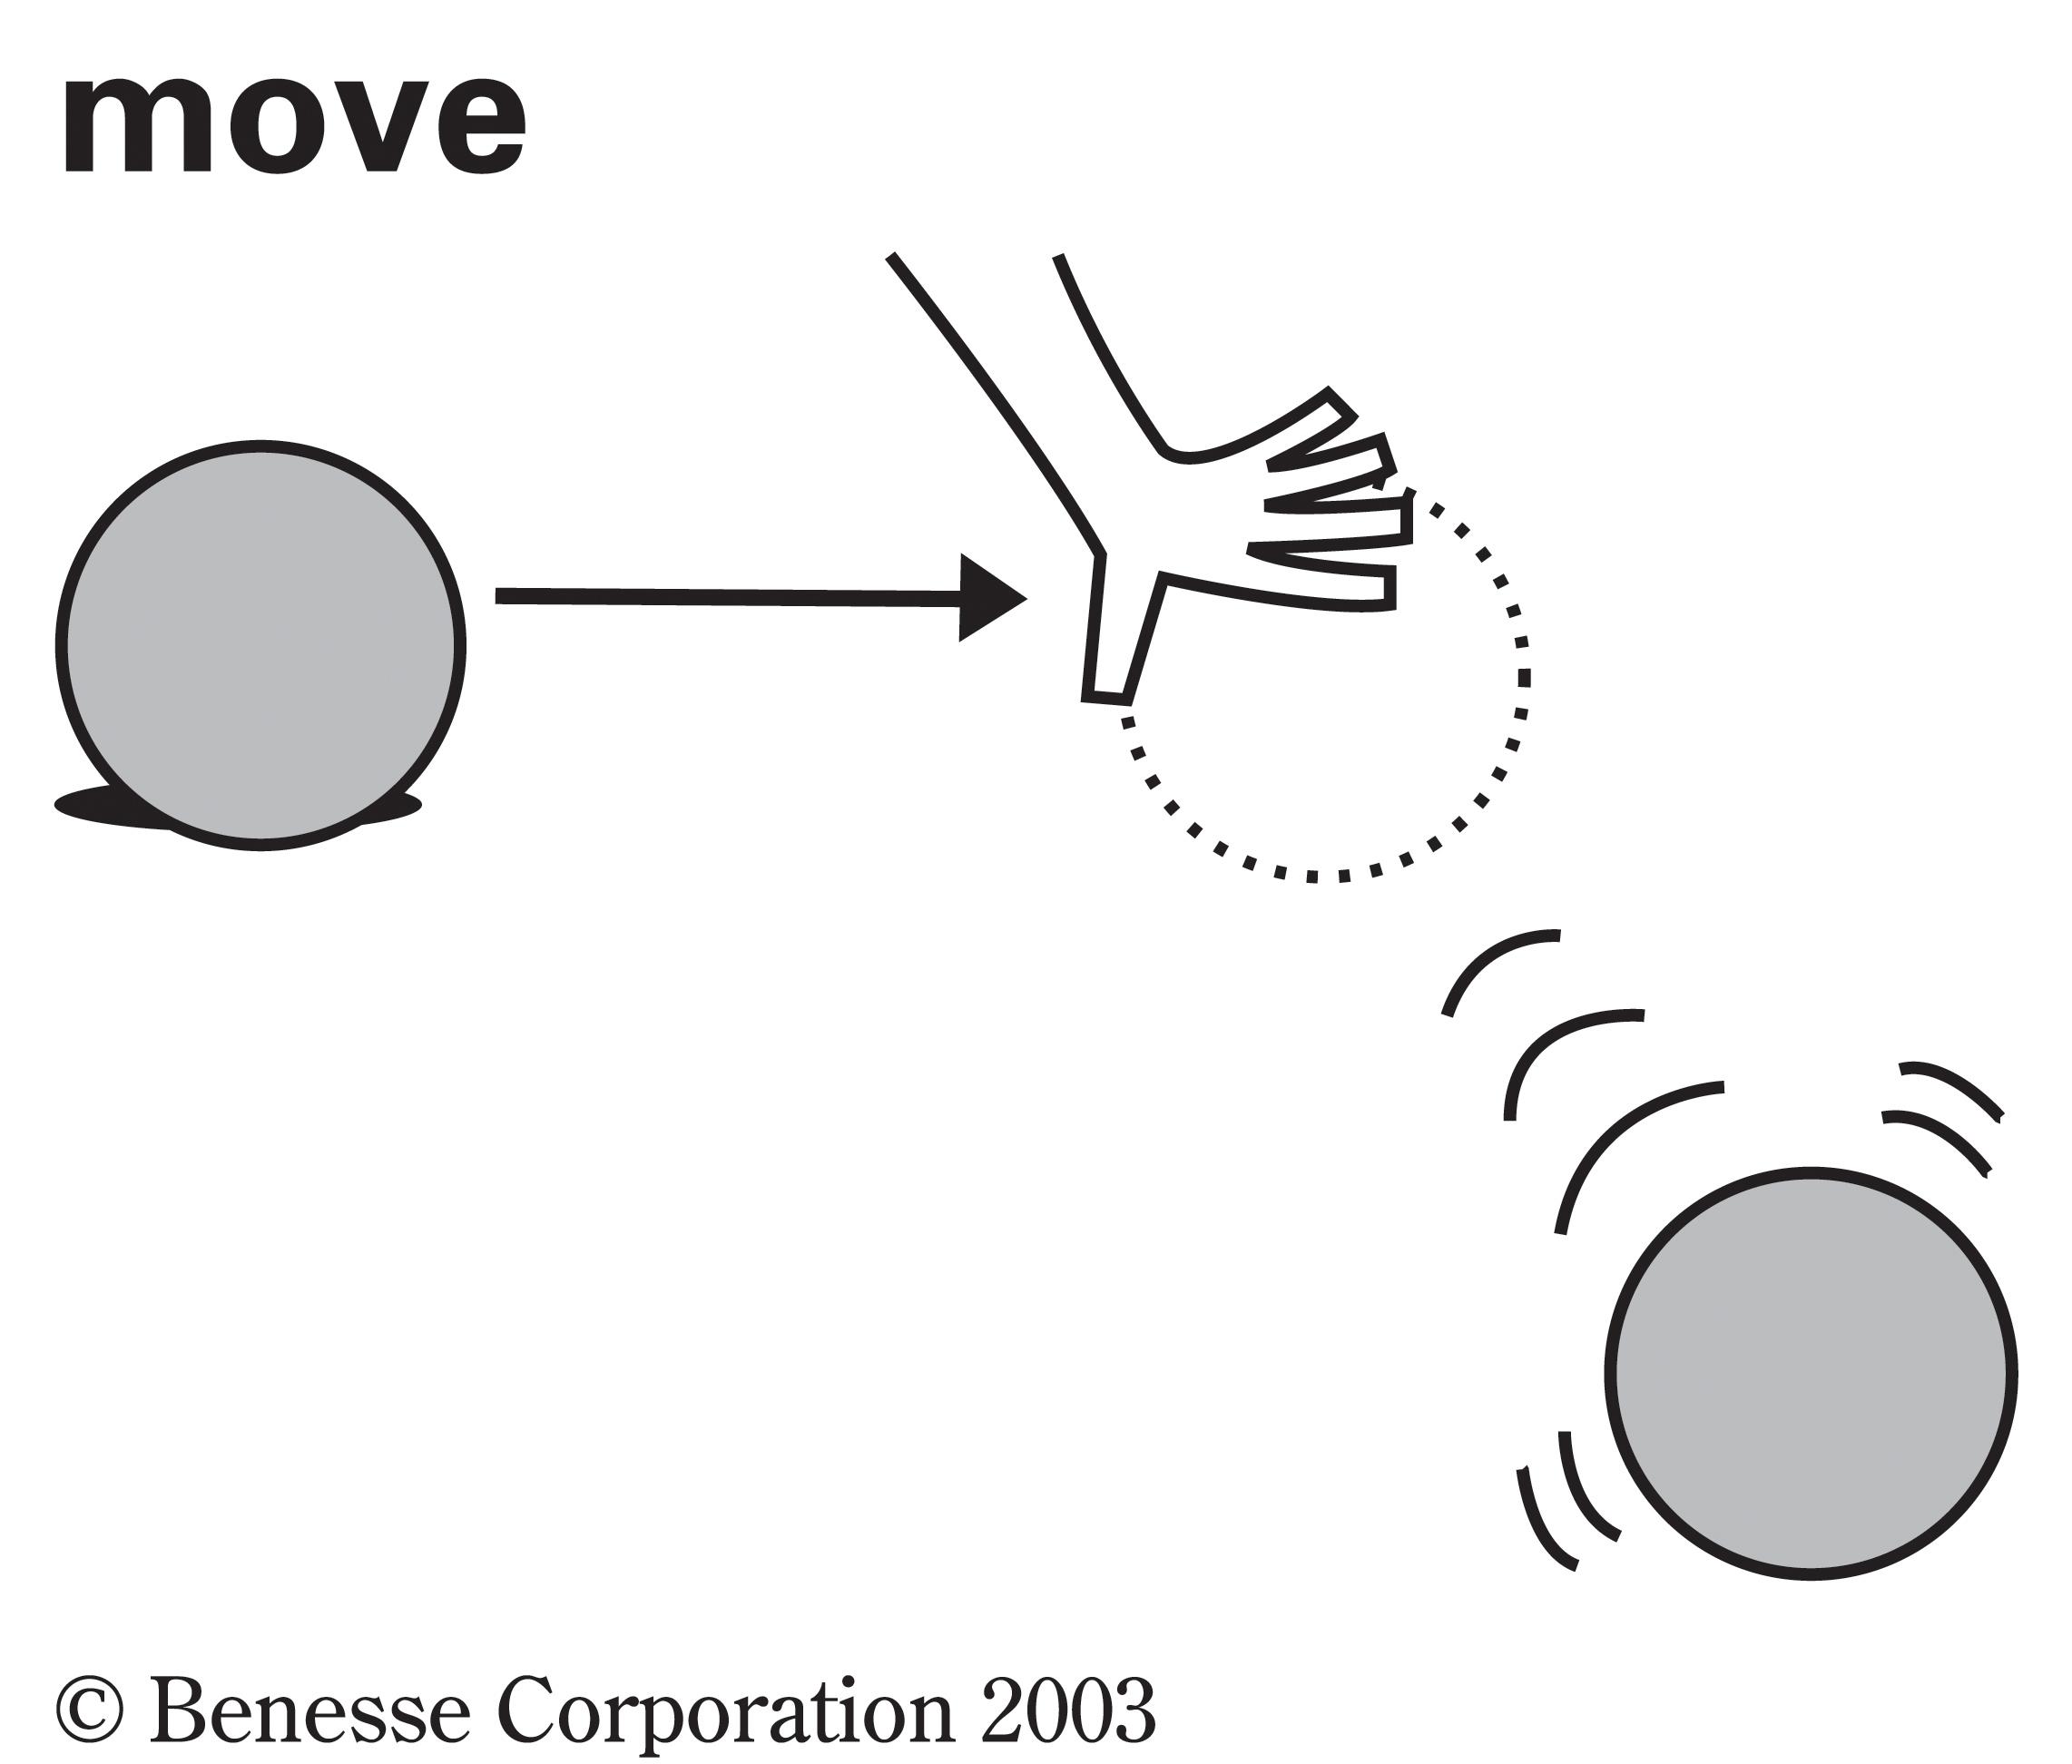 move01.jpg